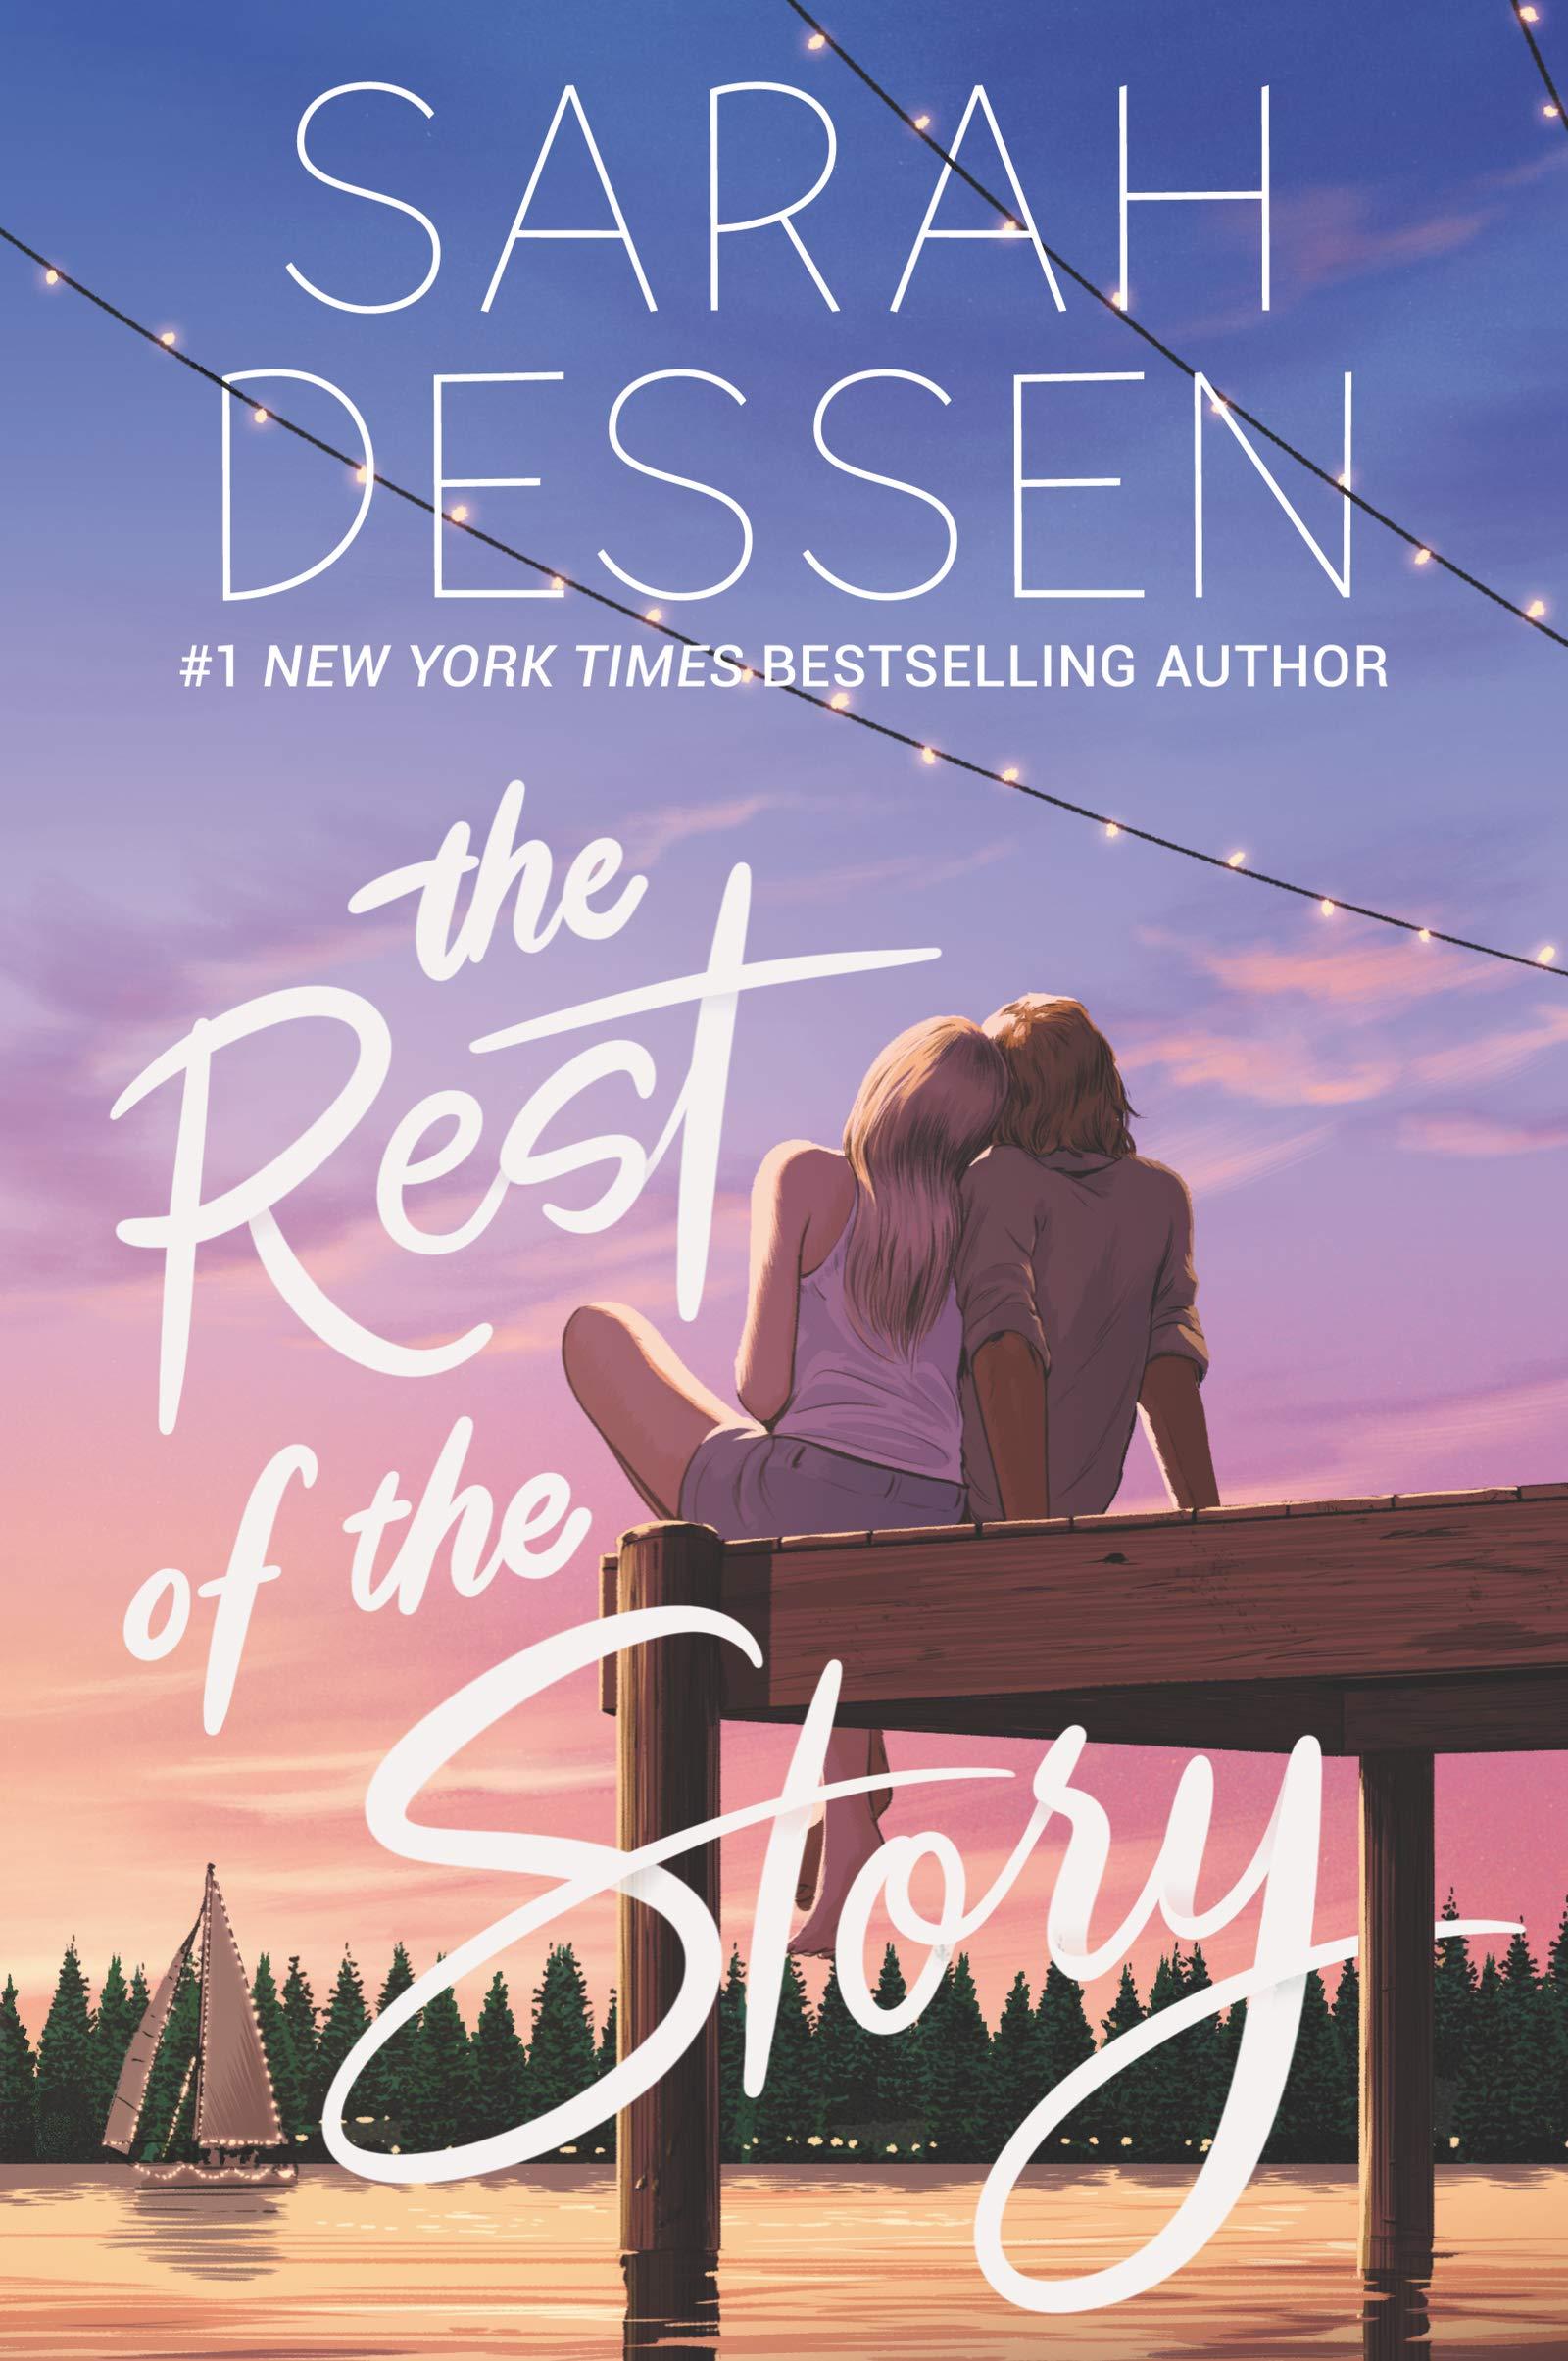 Amazon.com: The Rest of the Story (9780062933638): Dessen, Sarah: Books